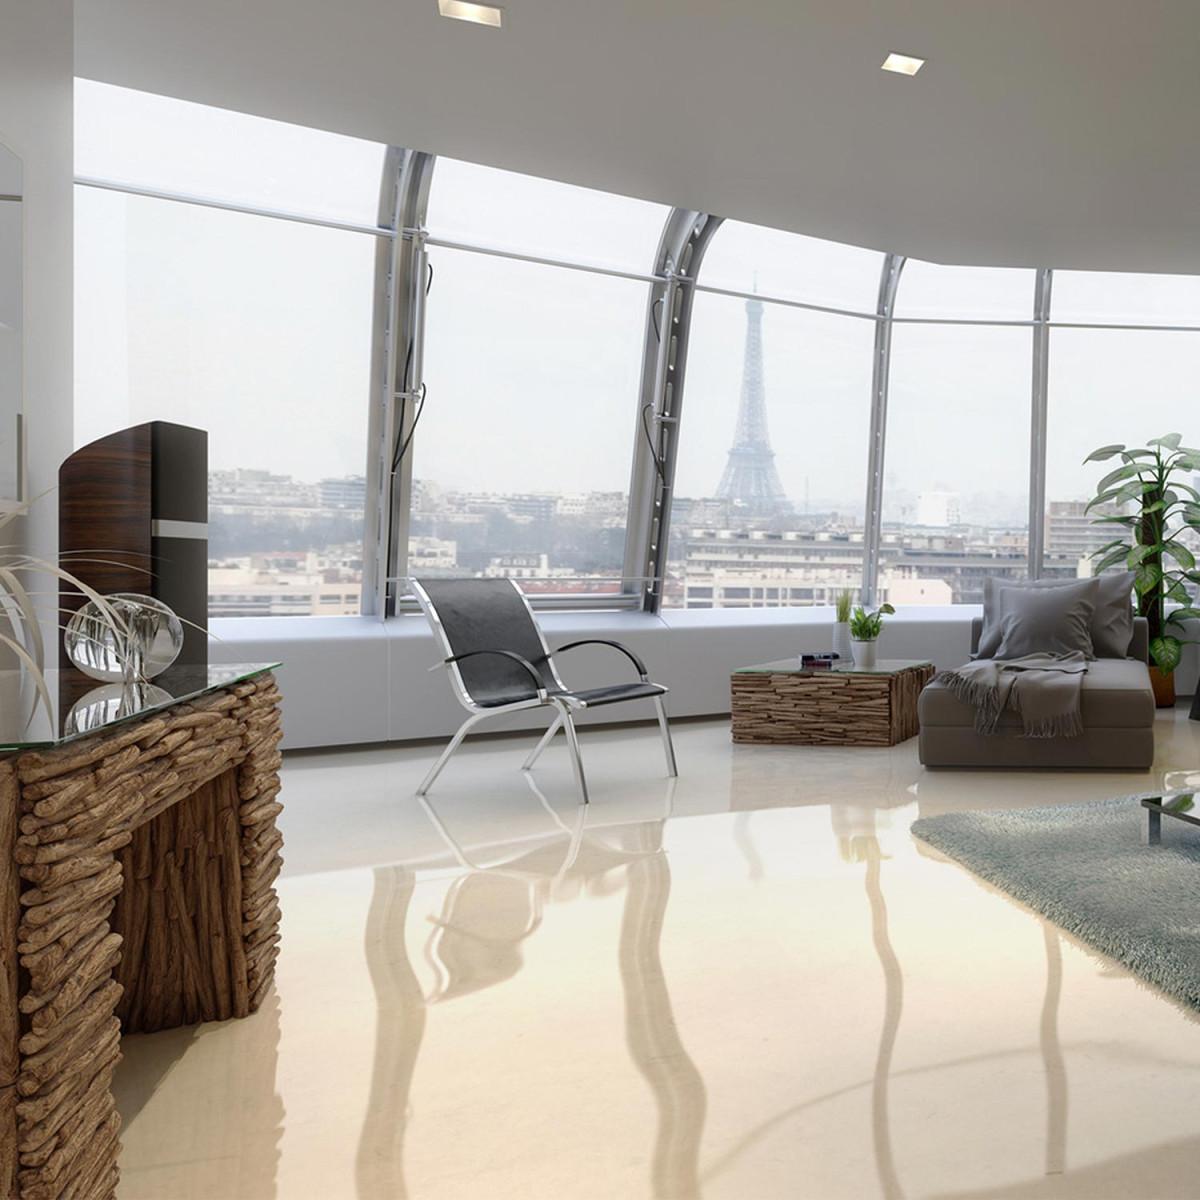 peinture epoxy revetement sol bi composant. Black Bedroom Furniture Sets. Home Design Ideas